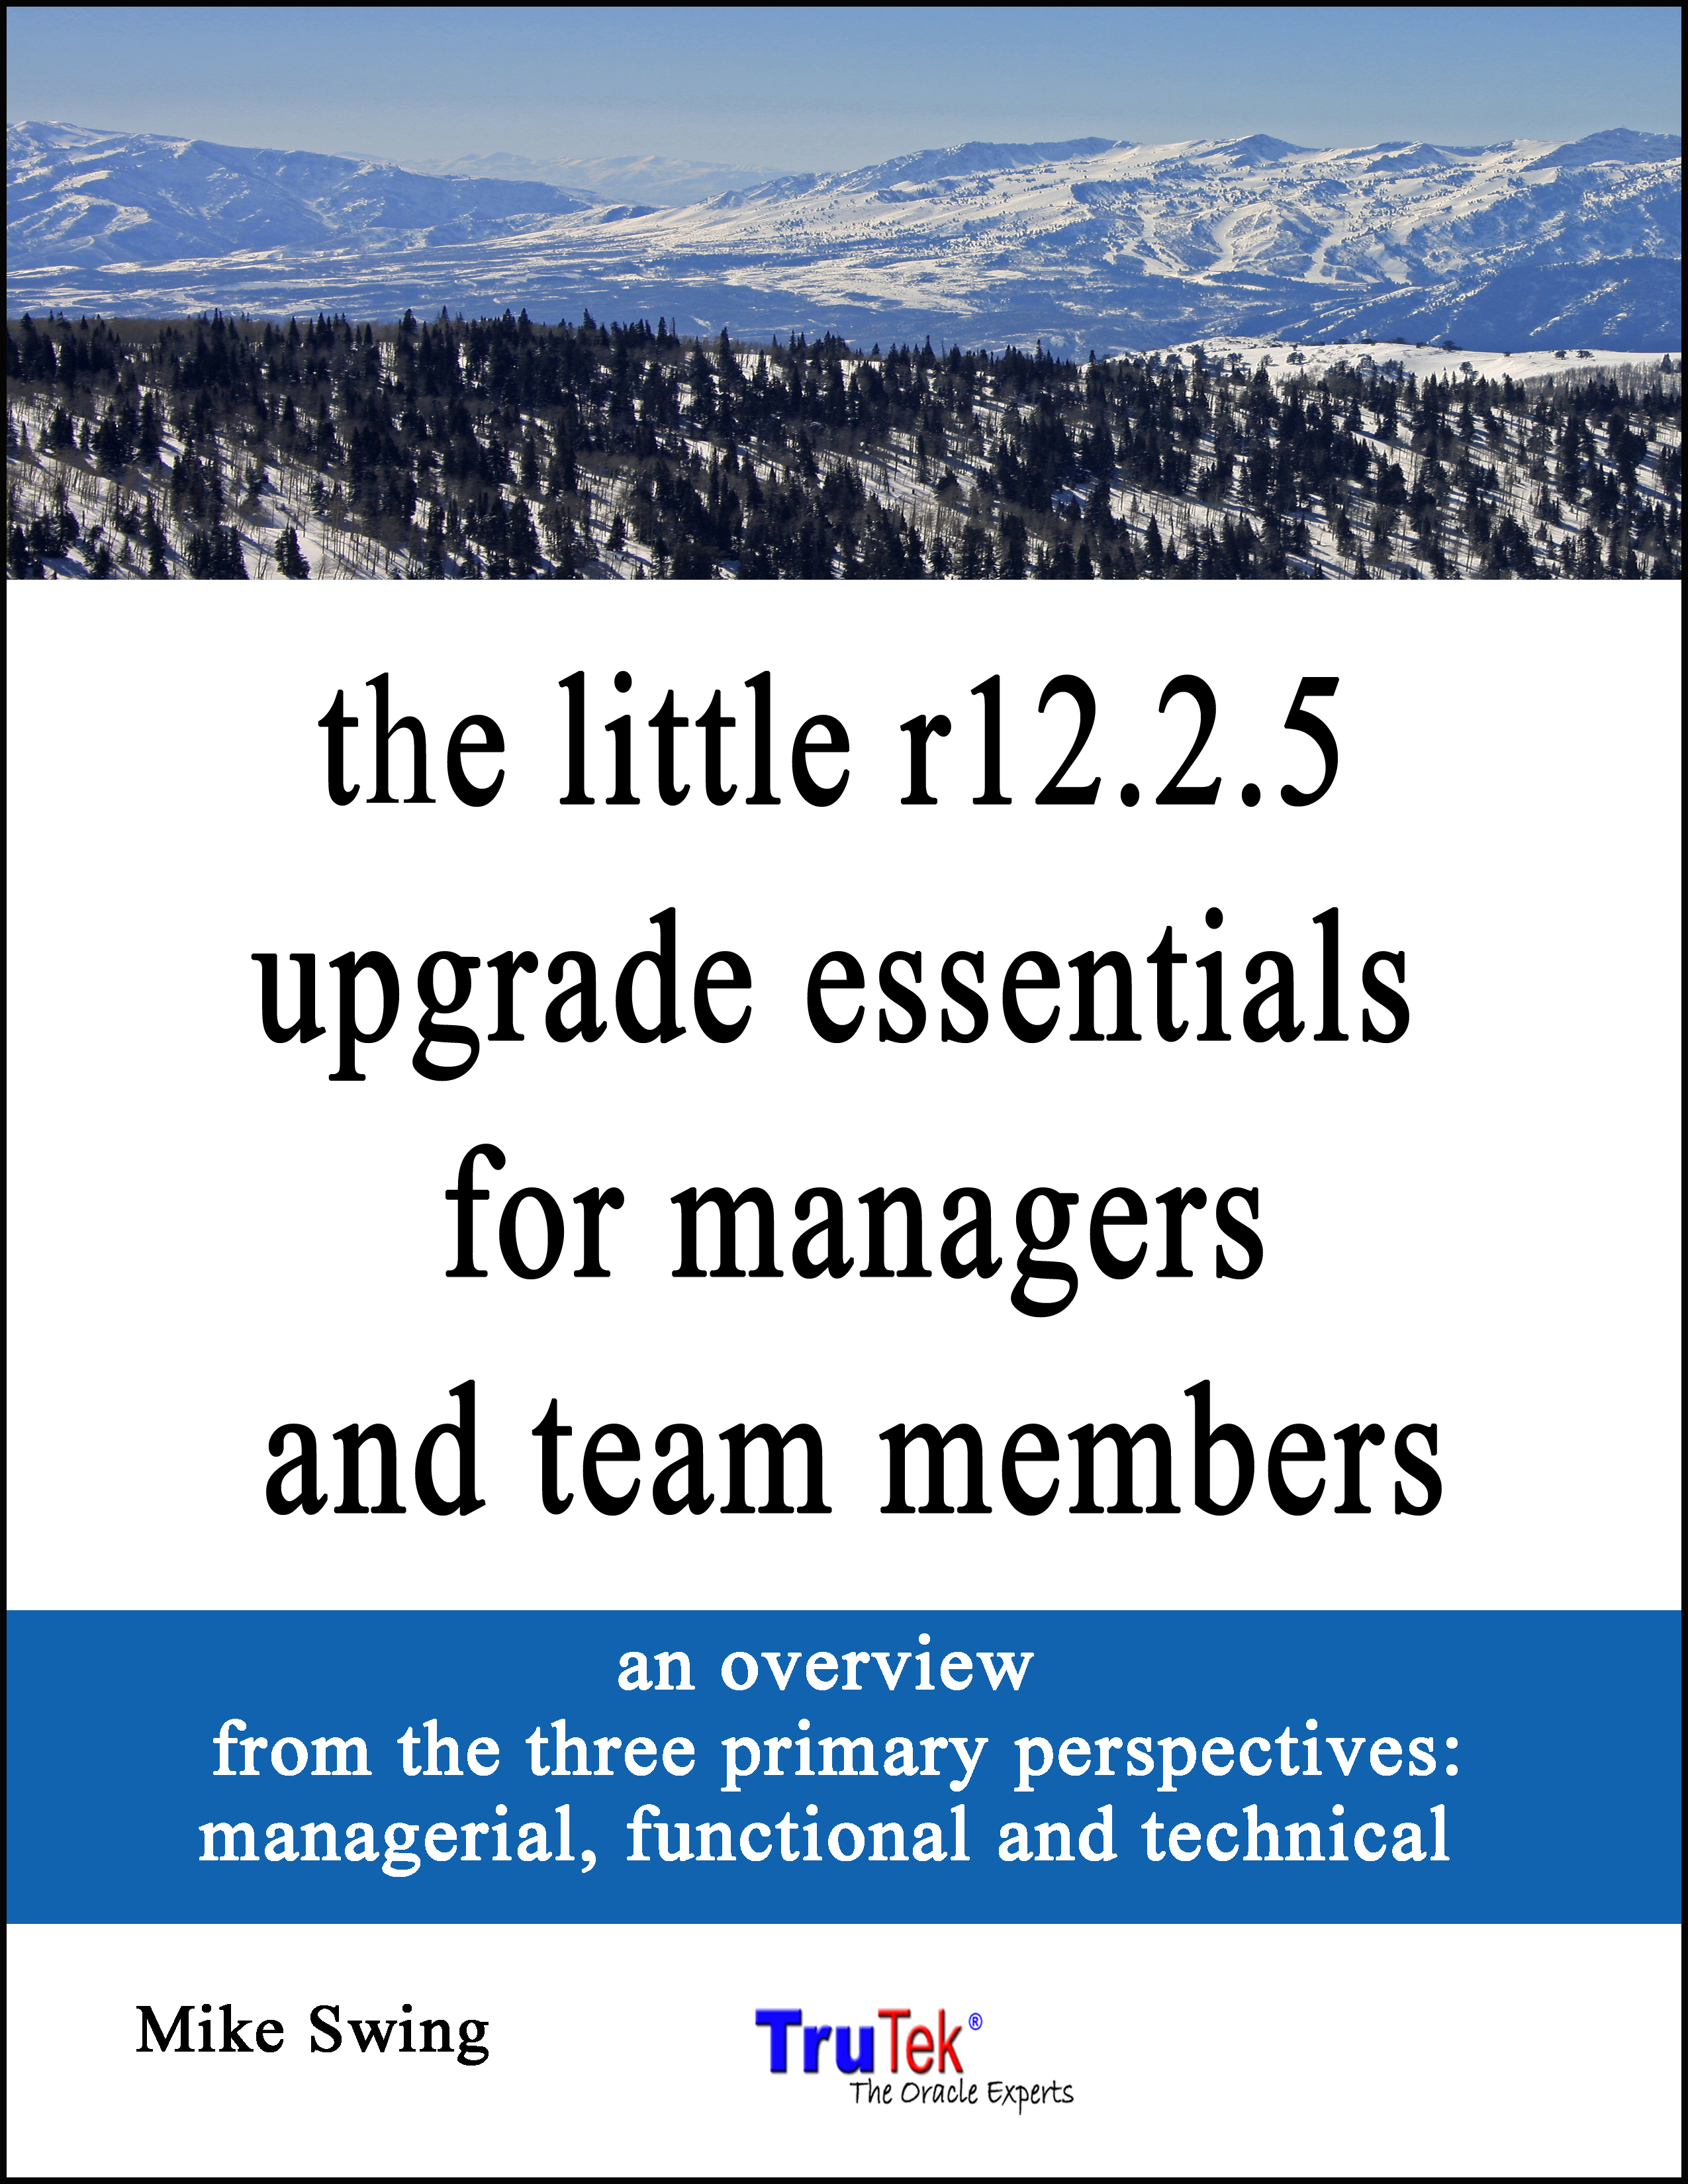 littler1225upgradeessentialsguideFRONTcover 03-29-16wBorder